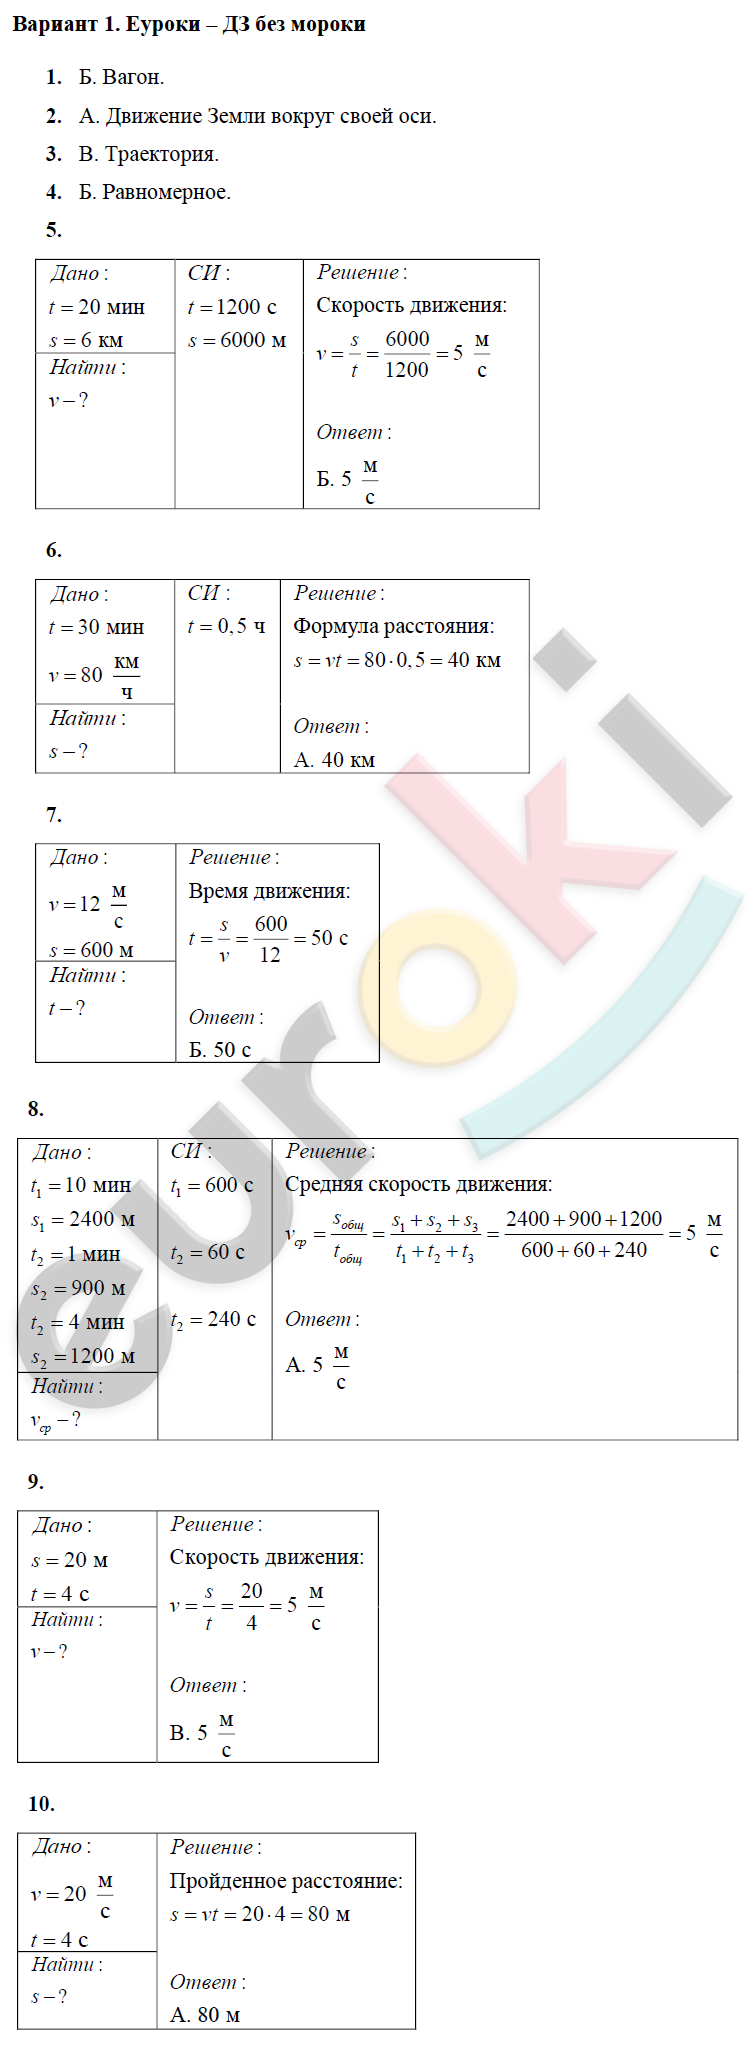 физике а.е.марон по по дидактическому класс гдз материалу 7